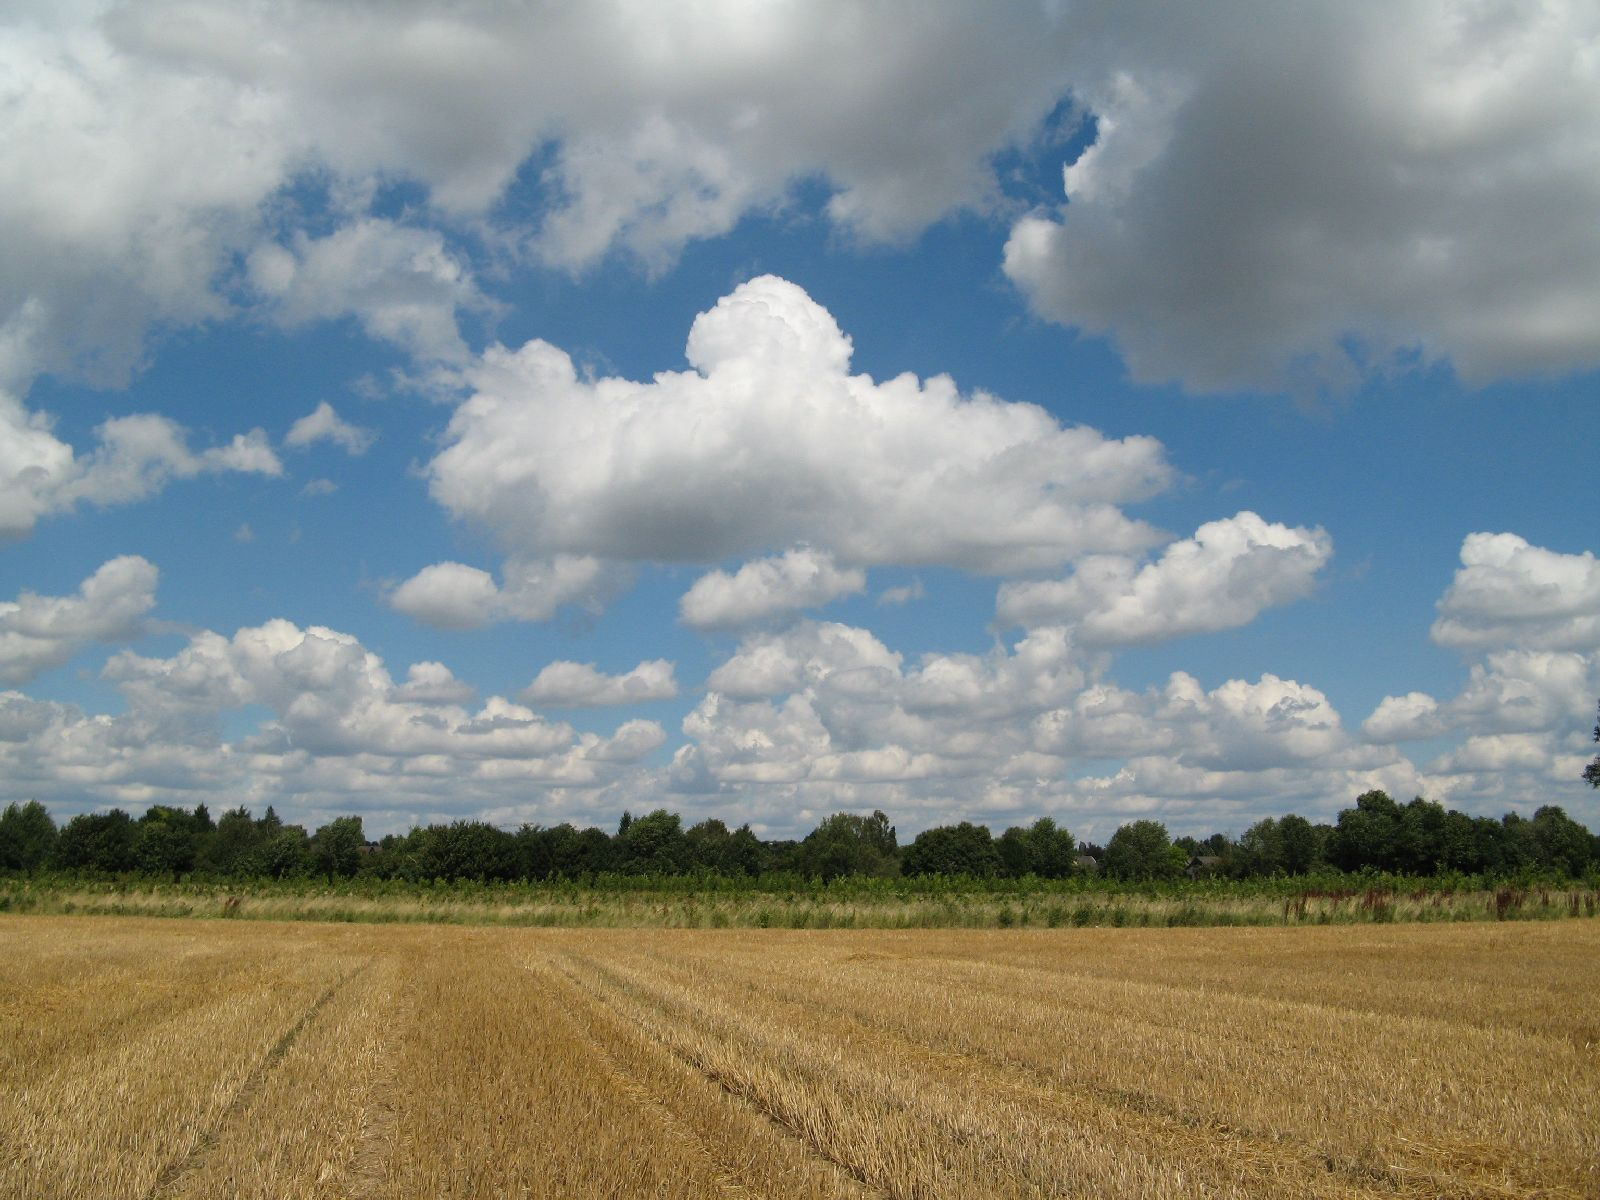 Himmel-Wolken-Foto_Textur_B_00994